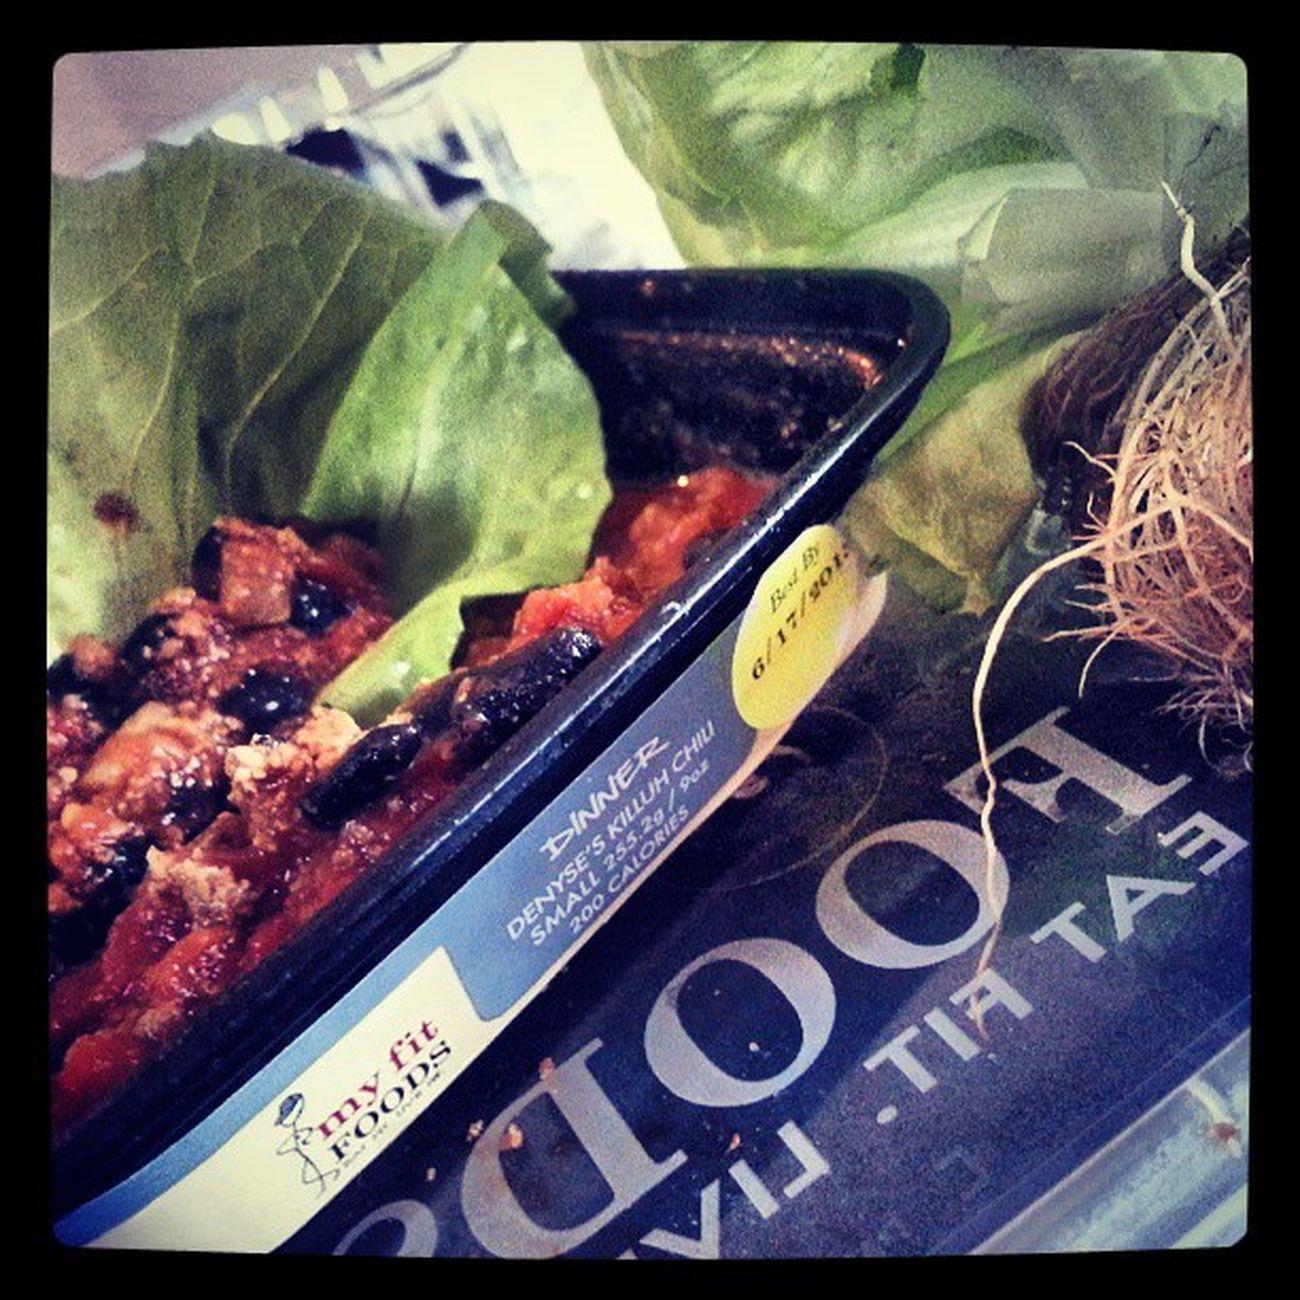 Dinner Myfitfoods Killuh Chili Tacos rapped in Bibb lettuce Superyum denyseskilluhchilli greens healthyeating healthyliving foodporn myfitfoods